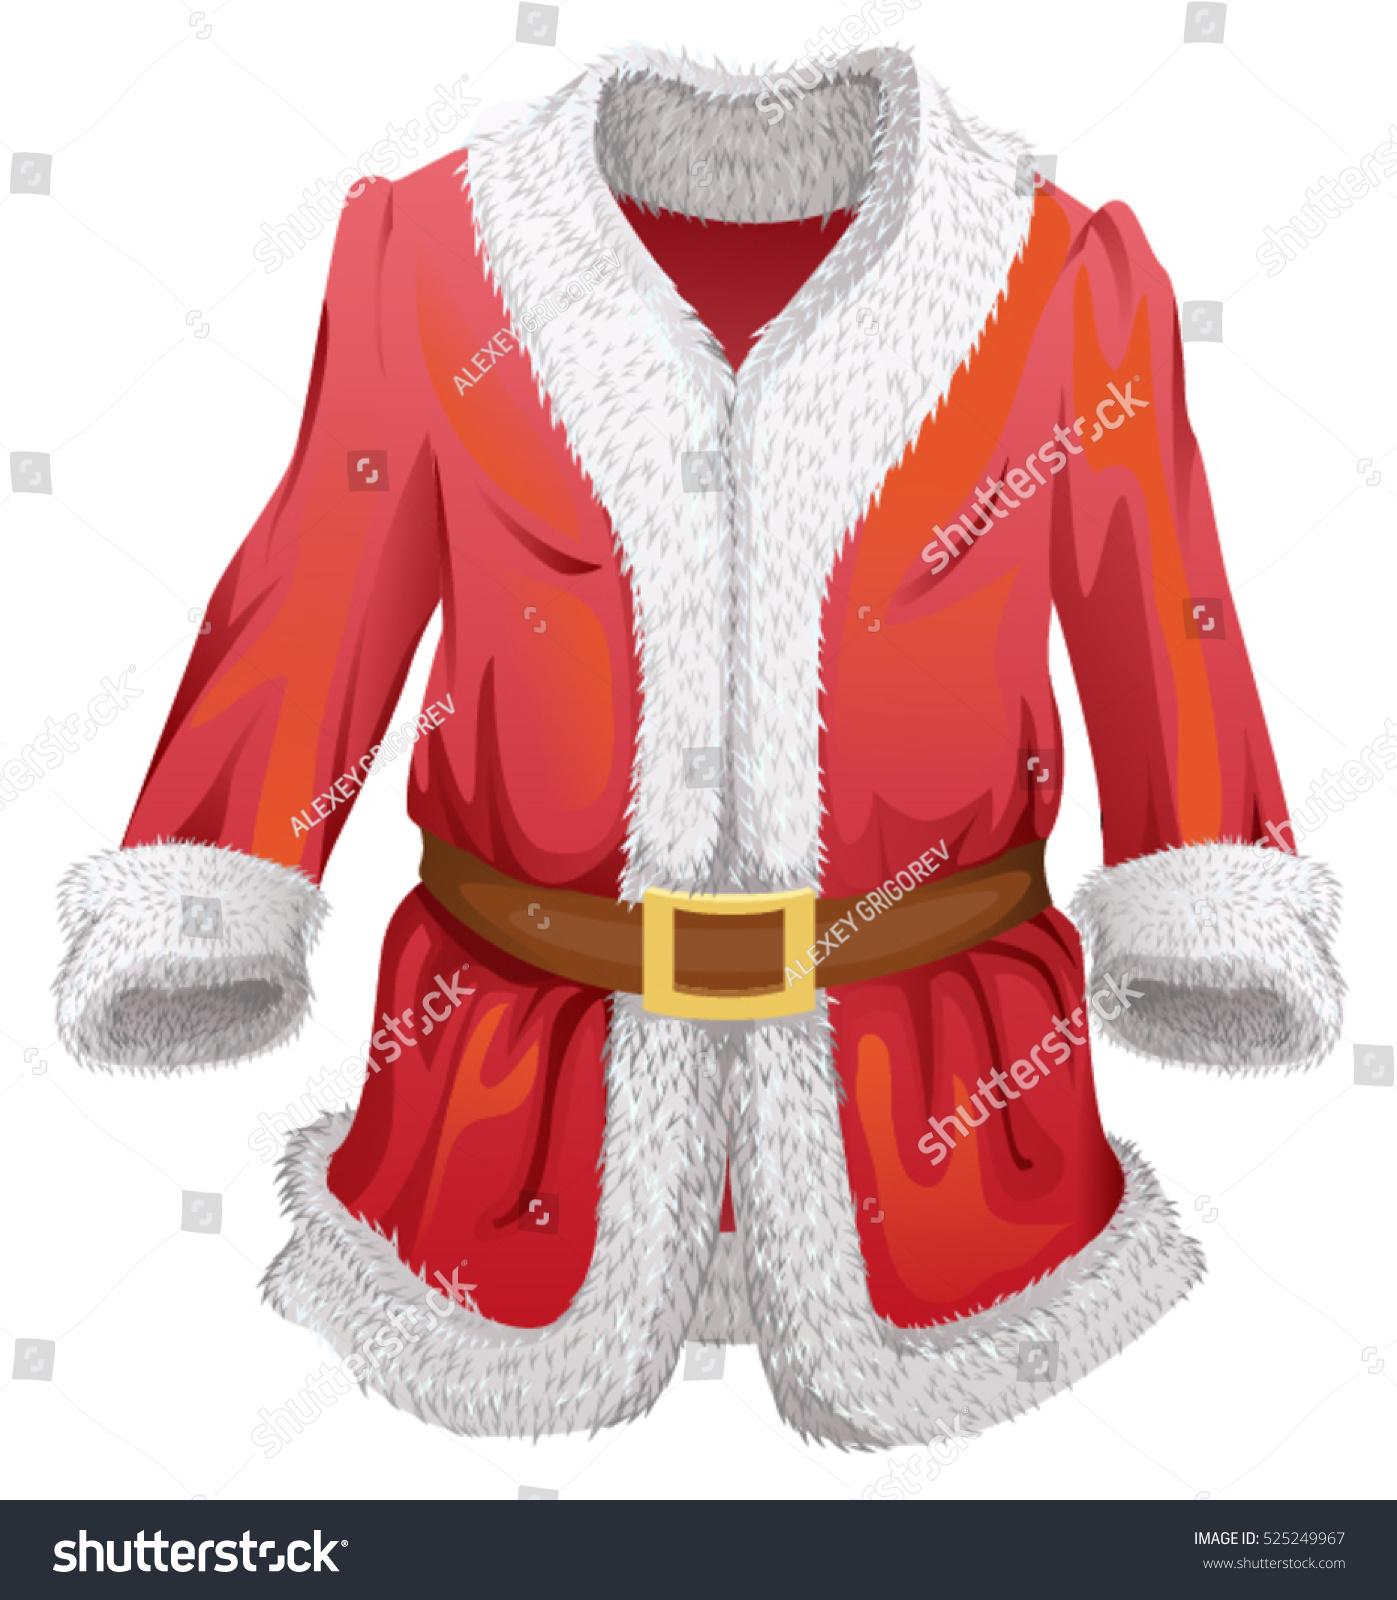 red fur coat of santa claus isolated on white vector cartoon illustration - Santa Claus Coat